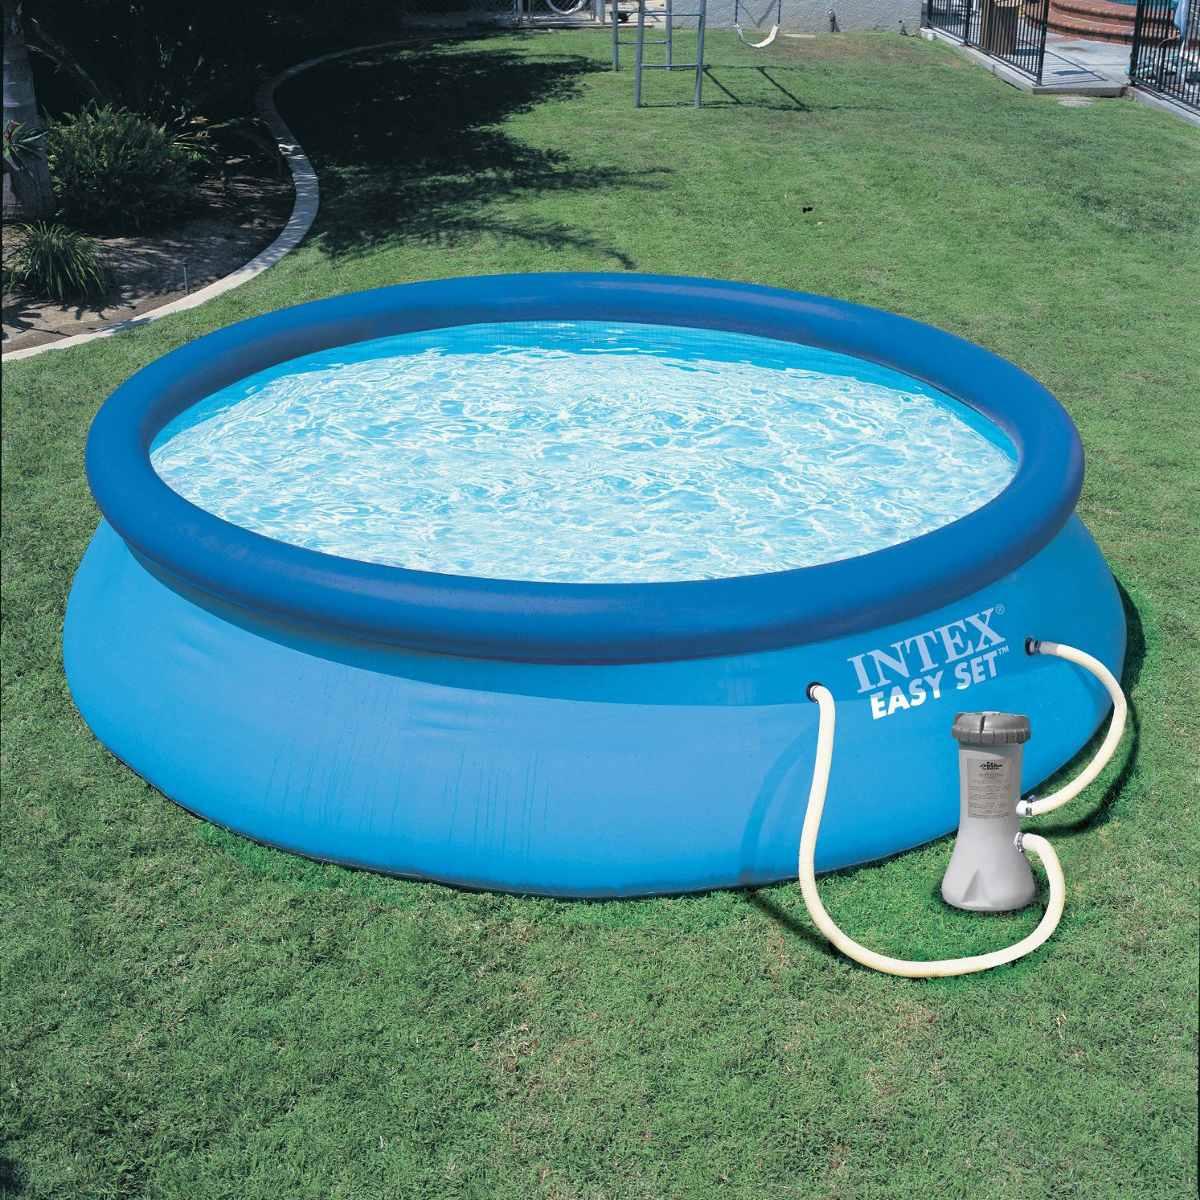 Piscina infl vel intex 6734 litros com bomba filtrante for Calcular litros piscina